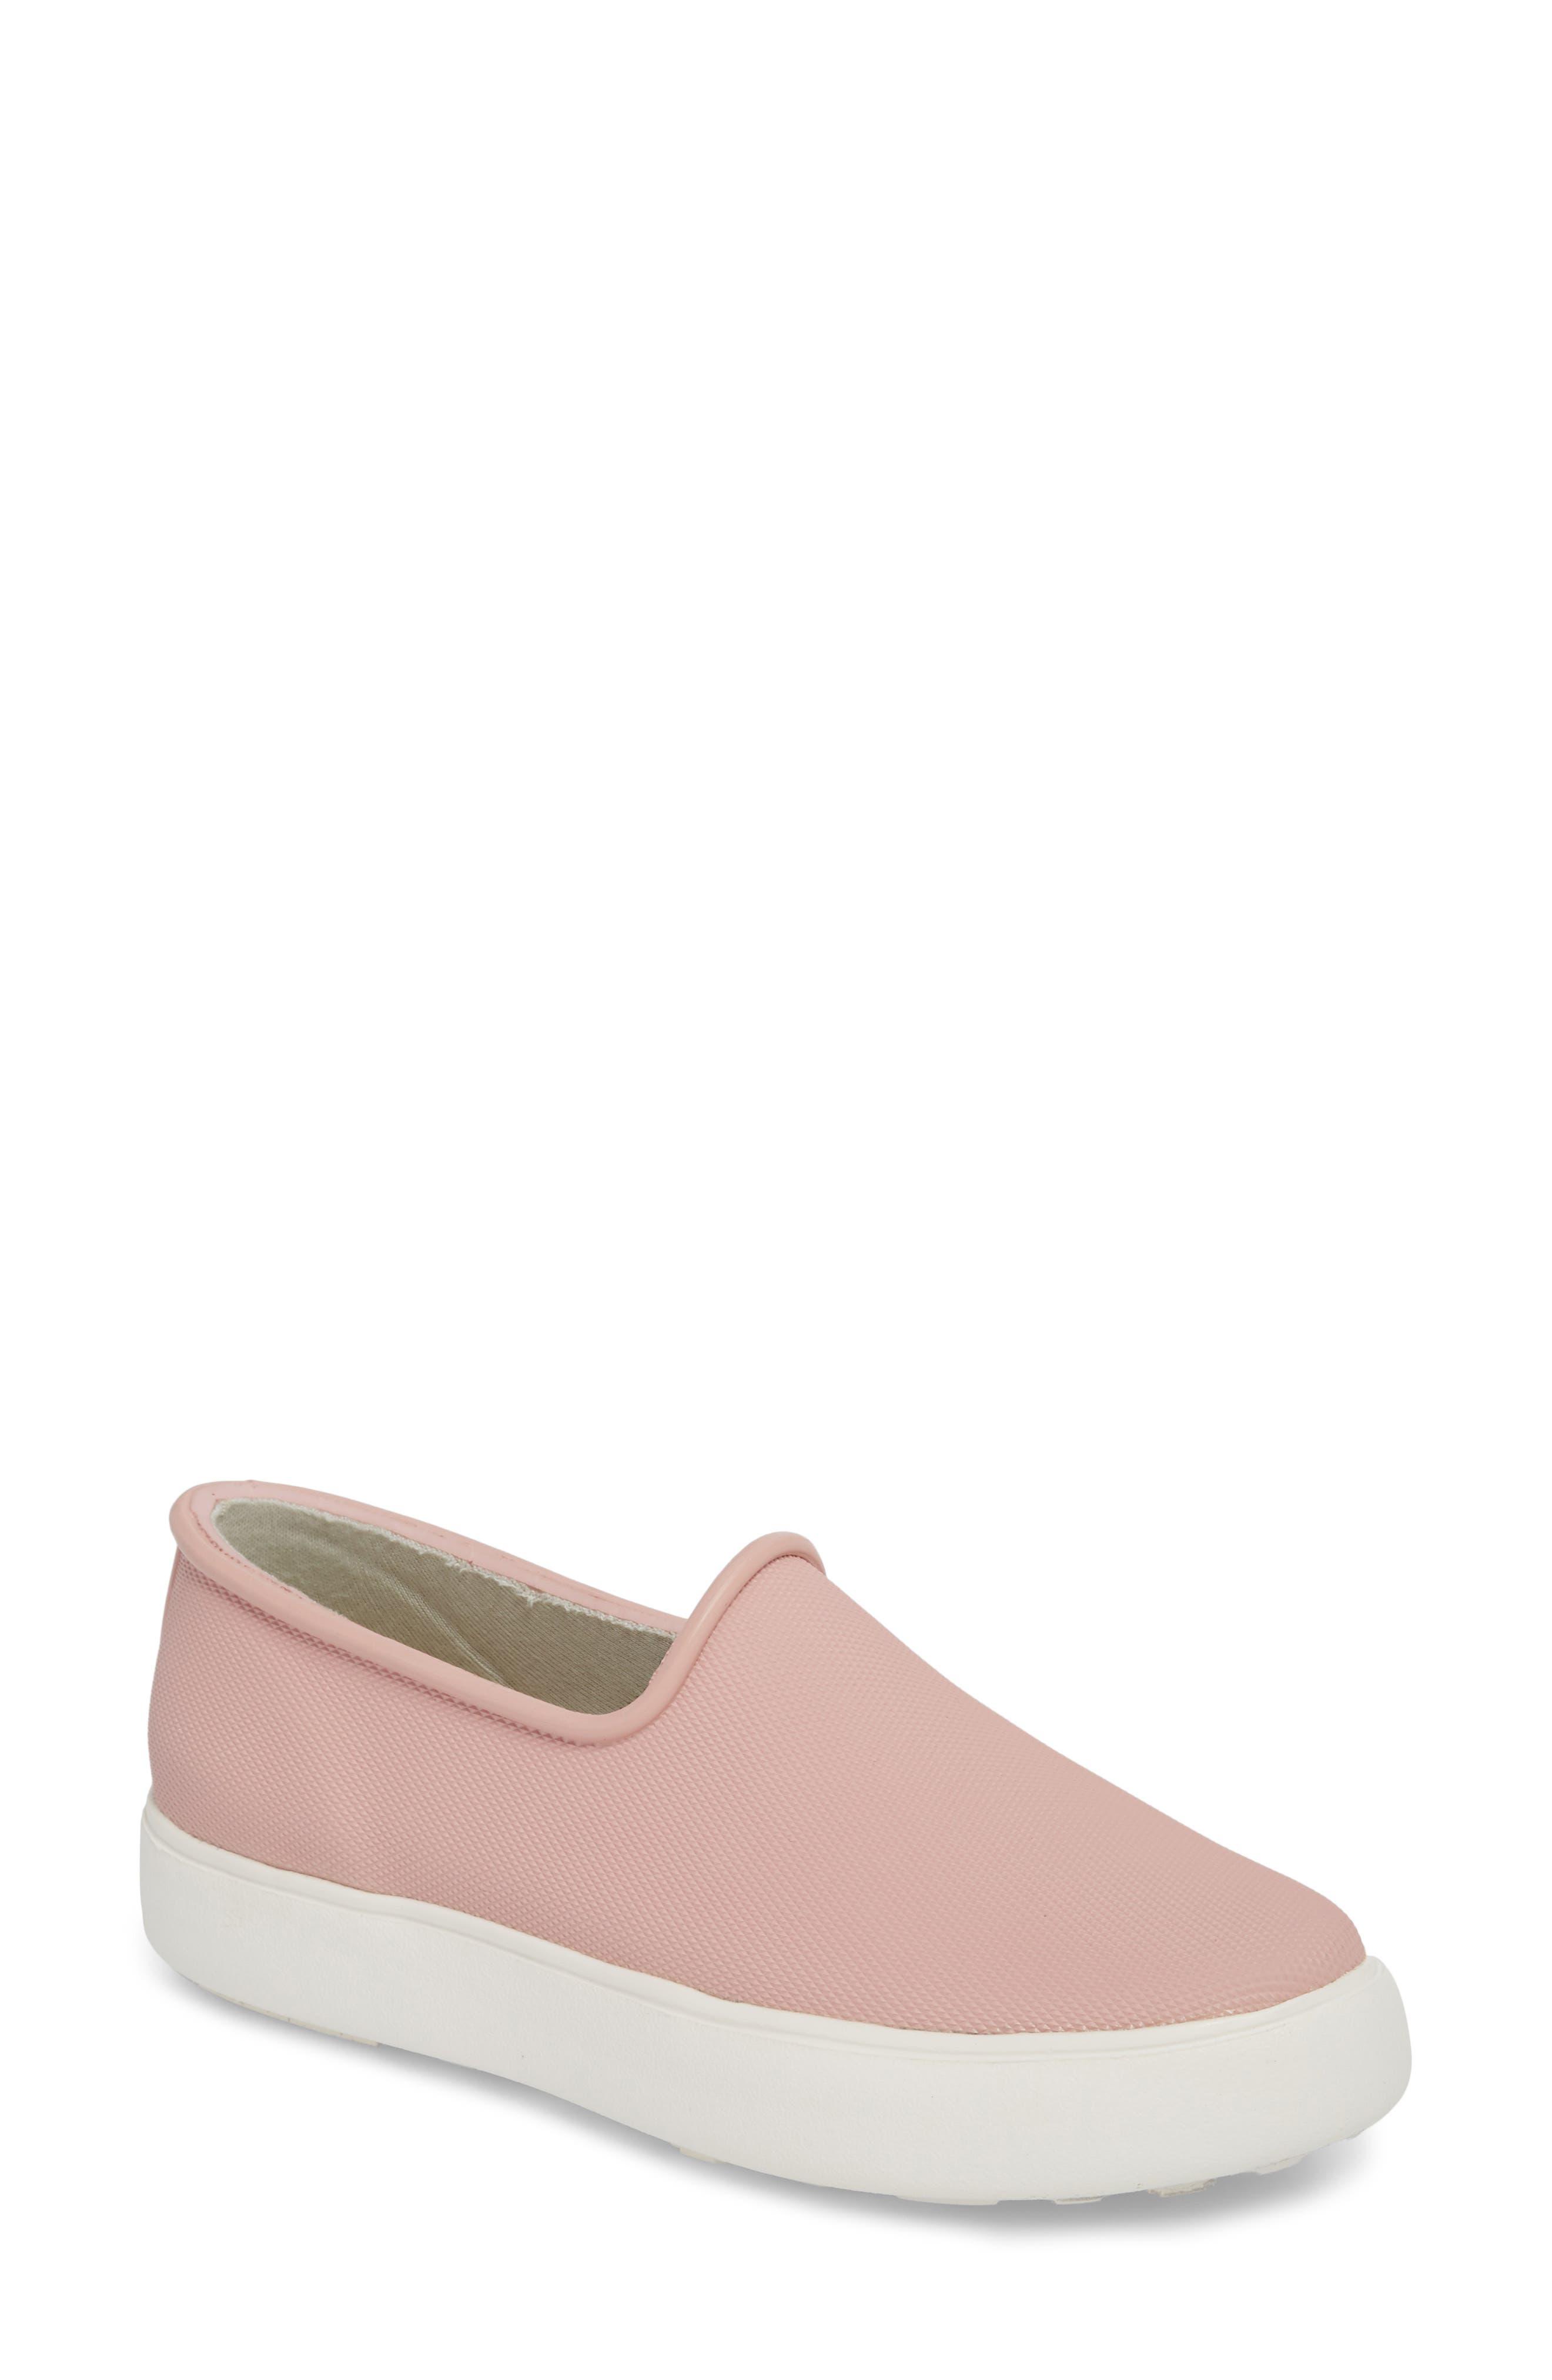 Rainy Day Waterproof Slip-On Sneaker,                             Main thumbnail 1, color,                             Dusty Pink